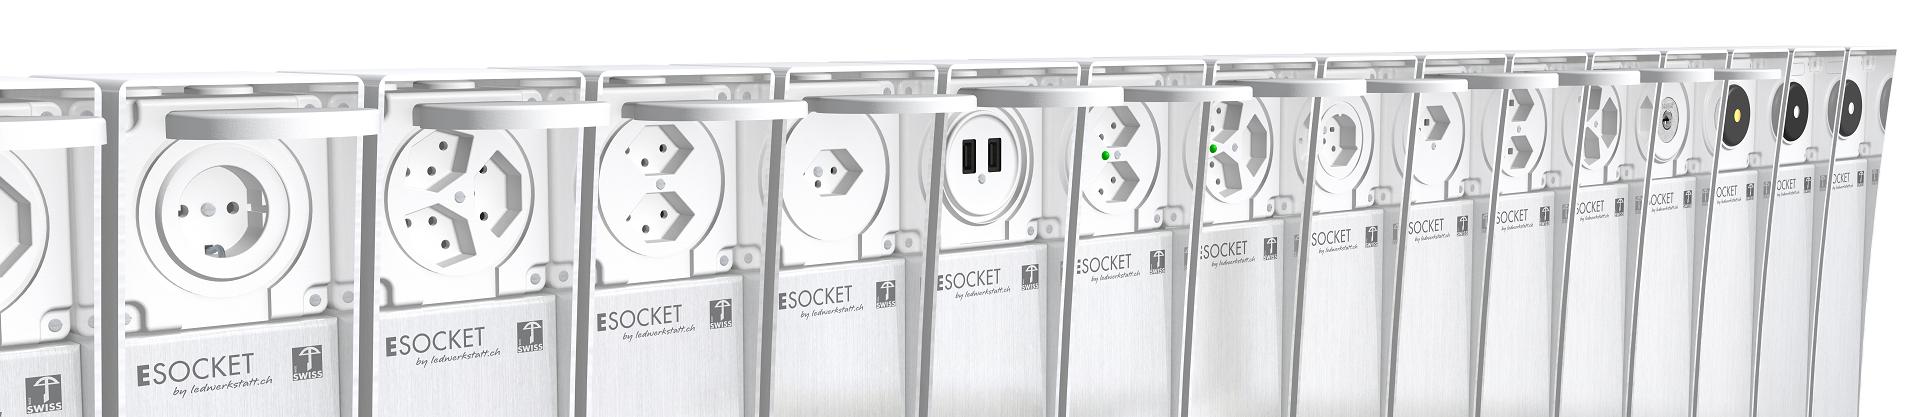 Elektroinstallateure, Steckdosensockel ESOCKET 350/900, Steckdosensäulen, Elektrosäulen und Wegleuchten in Edelstahl (INOX) Swissmade